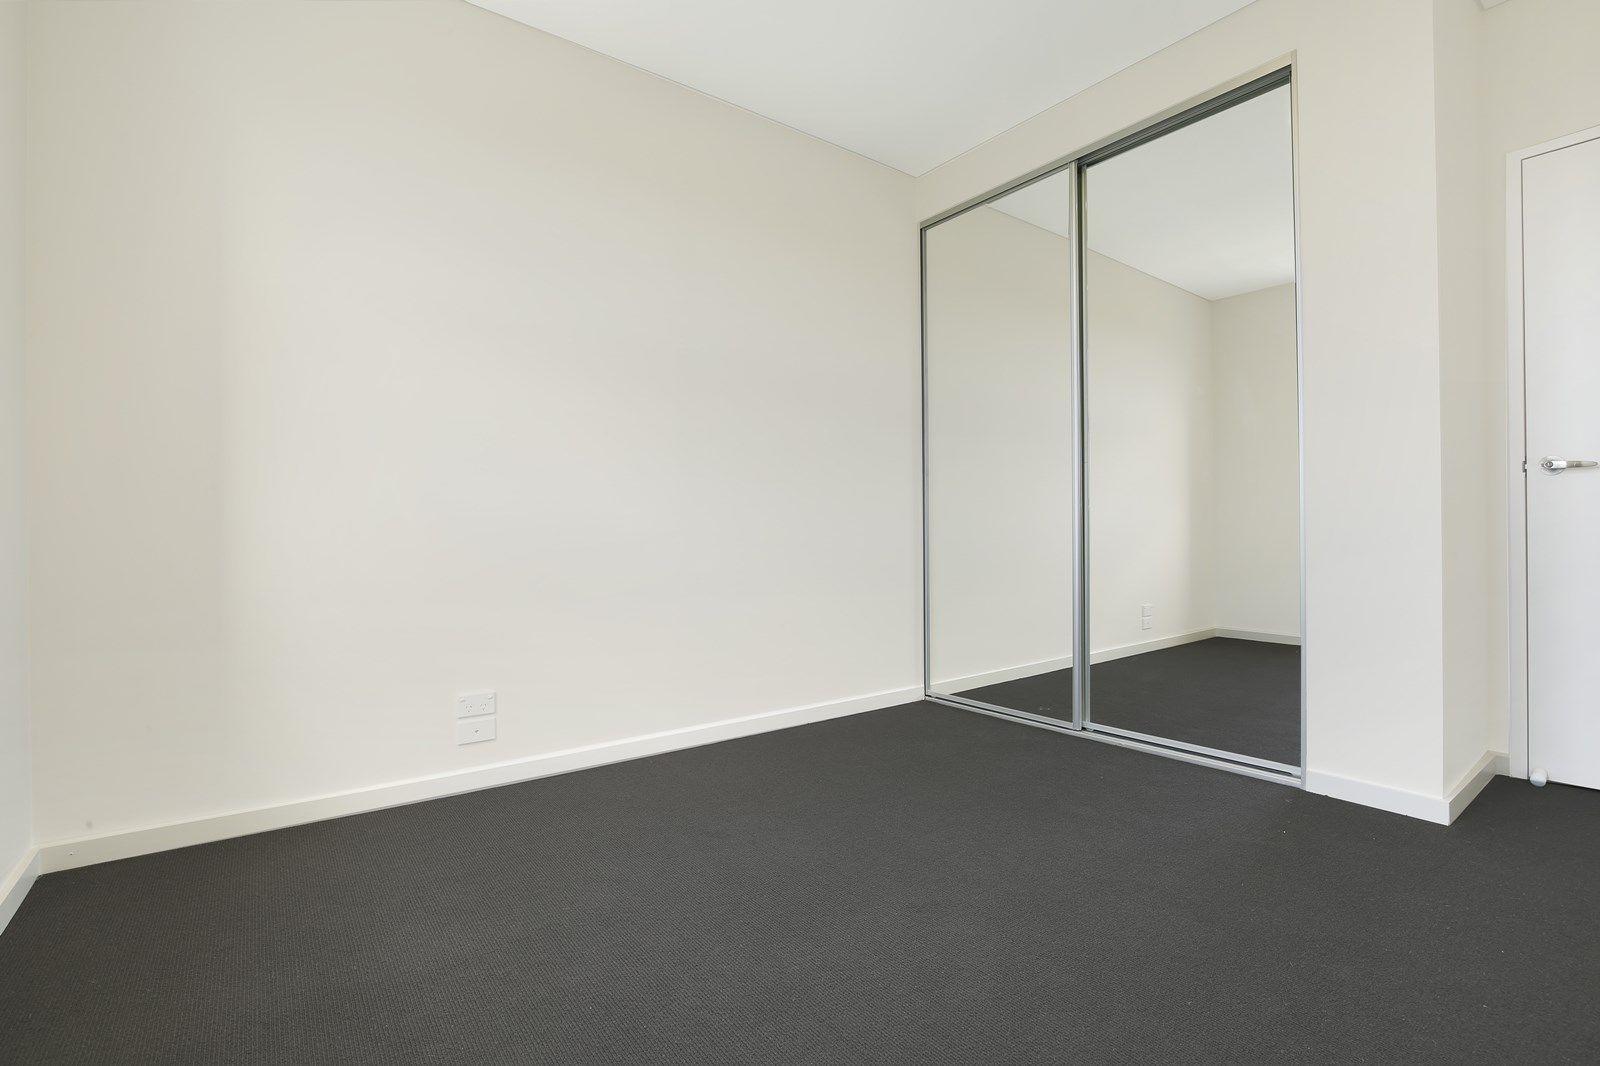 13/61 Keira  Street, Wollongong NSW 2500, Image 2